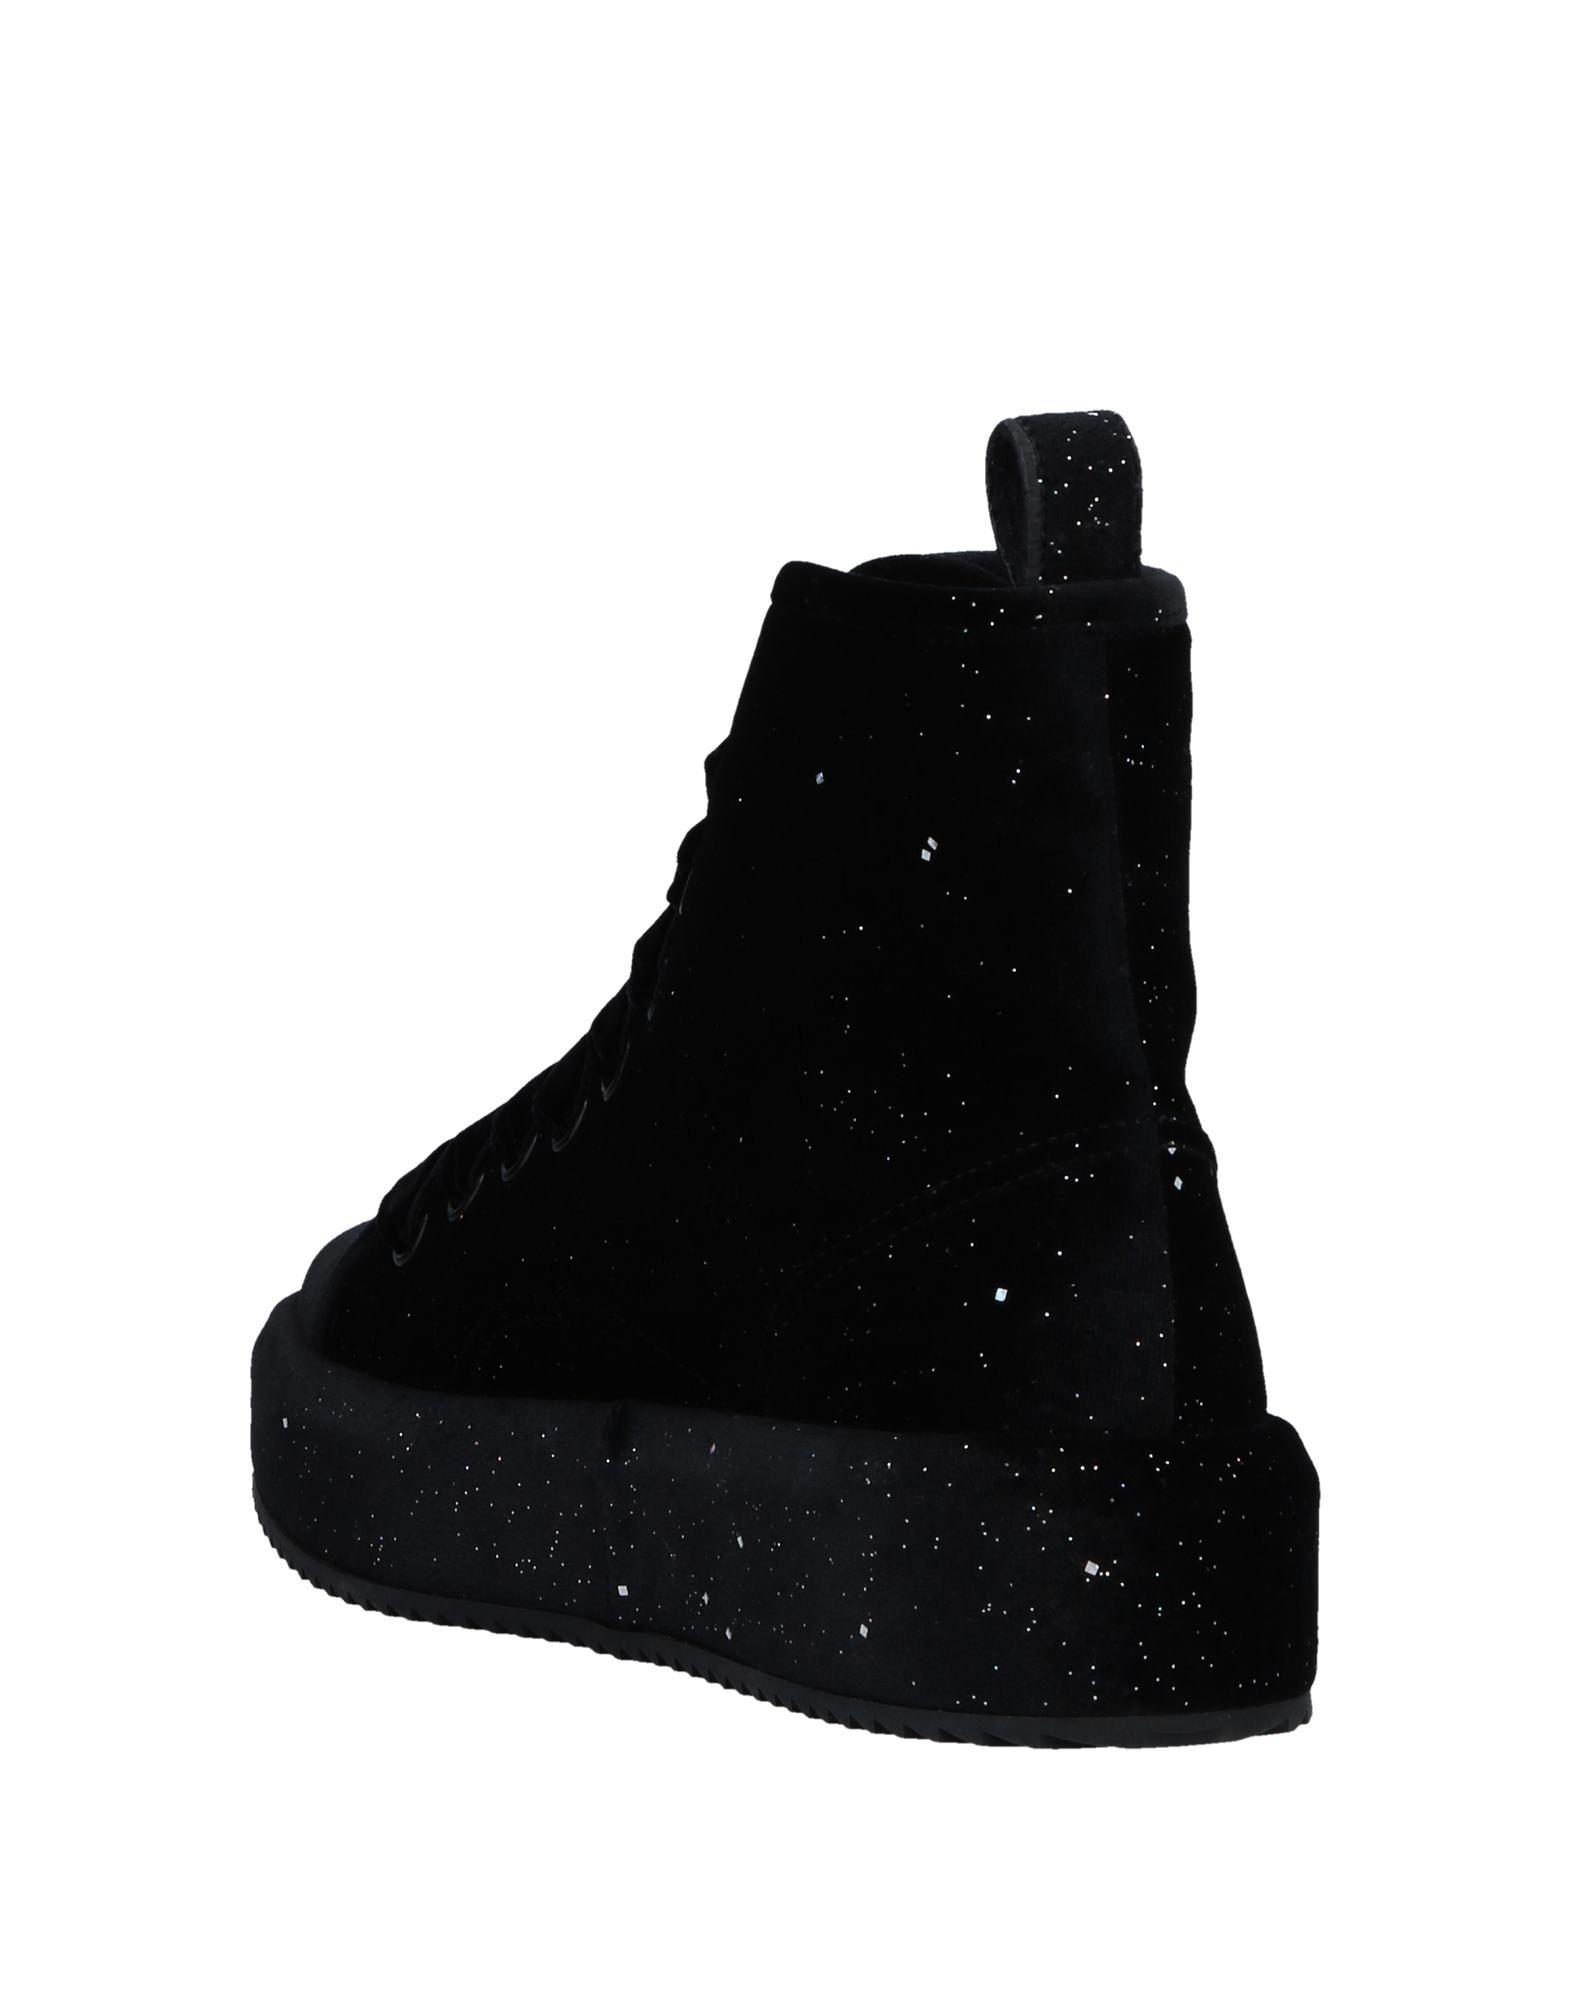 Marco De Vincenzo gut Stiefelette Damen  11517801IVGünstige gut Vincenzo aussehende Schuhe 7b6665